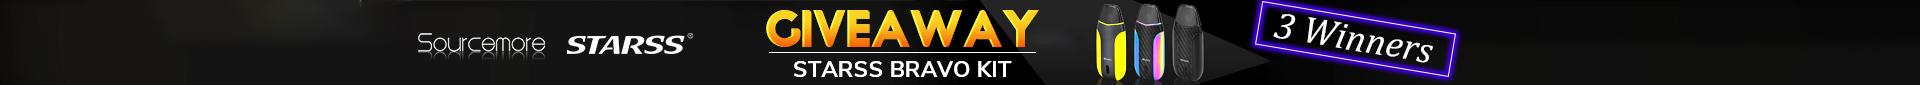 Starss Bravo Pod Kit Giveaway